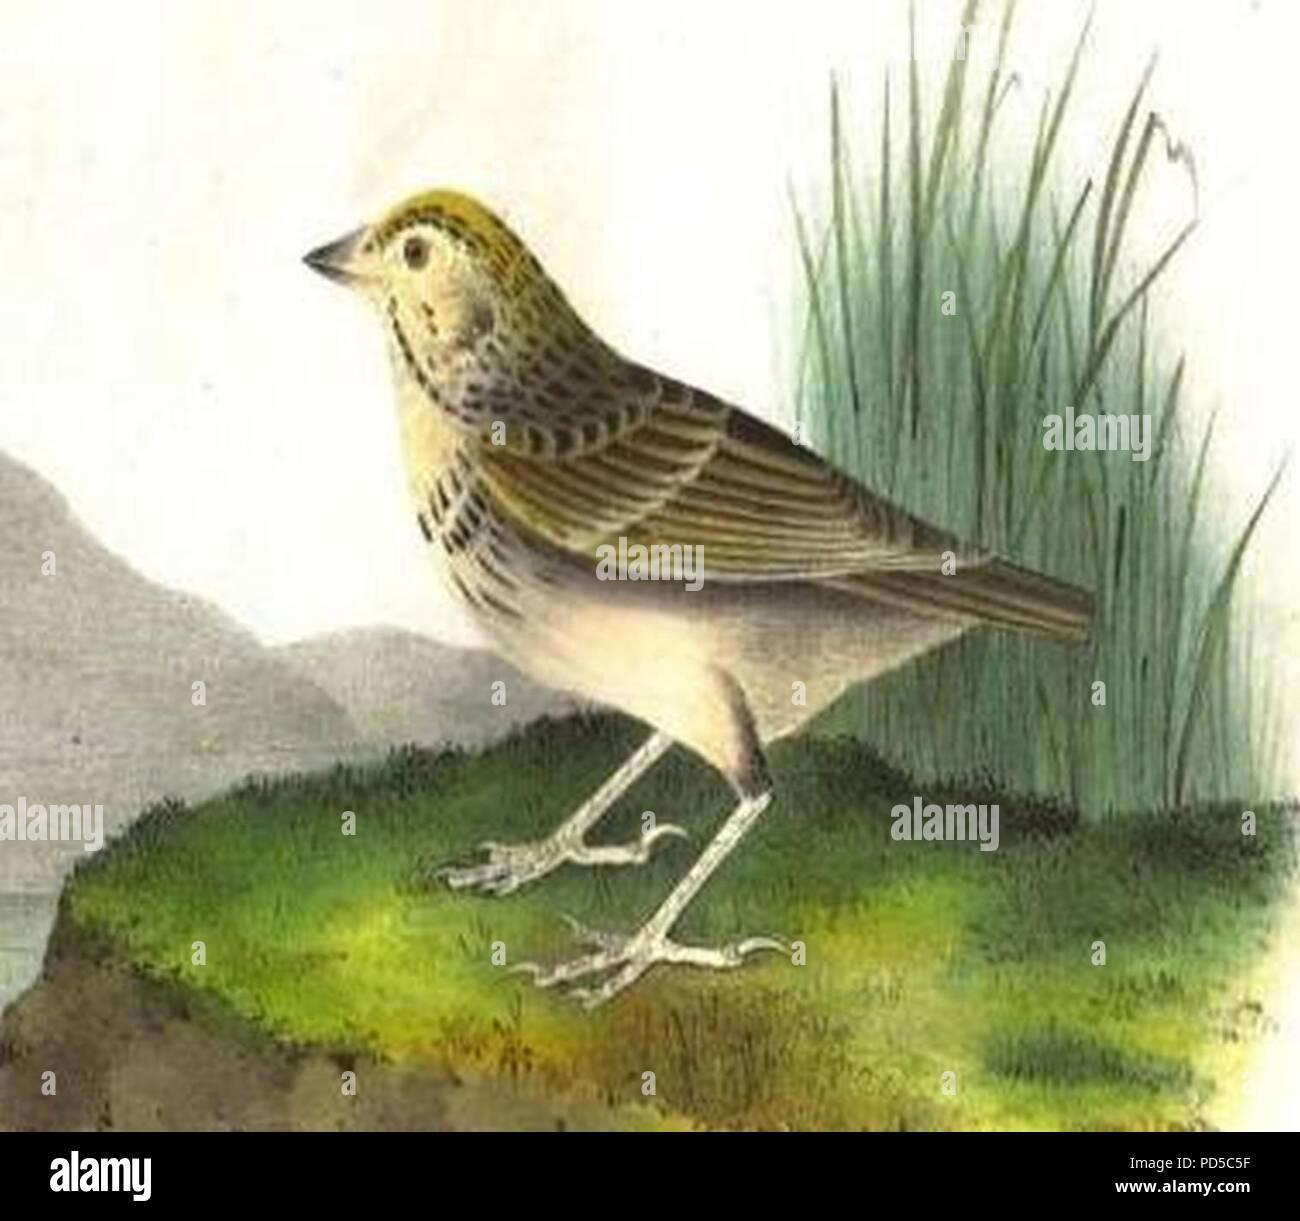 Ammodramus bairdii (Audubon). - Stock Image